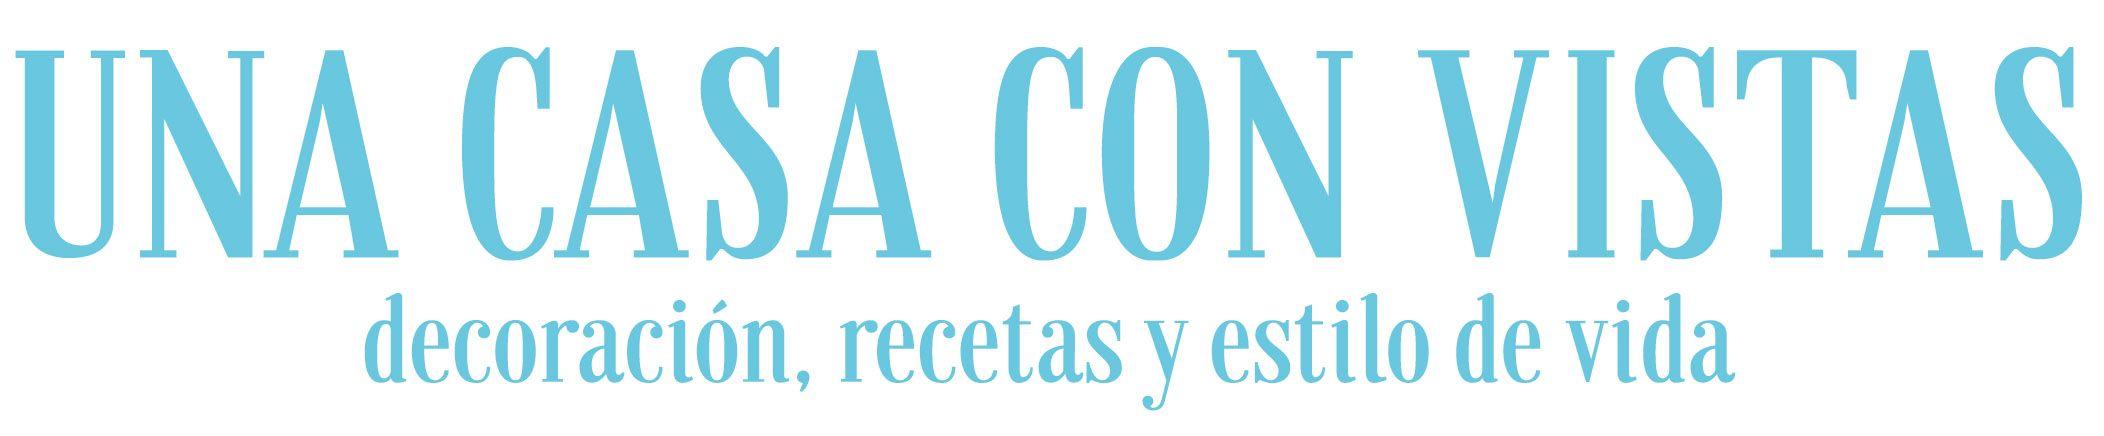 cabecera-uccv